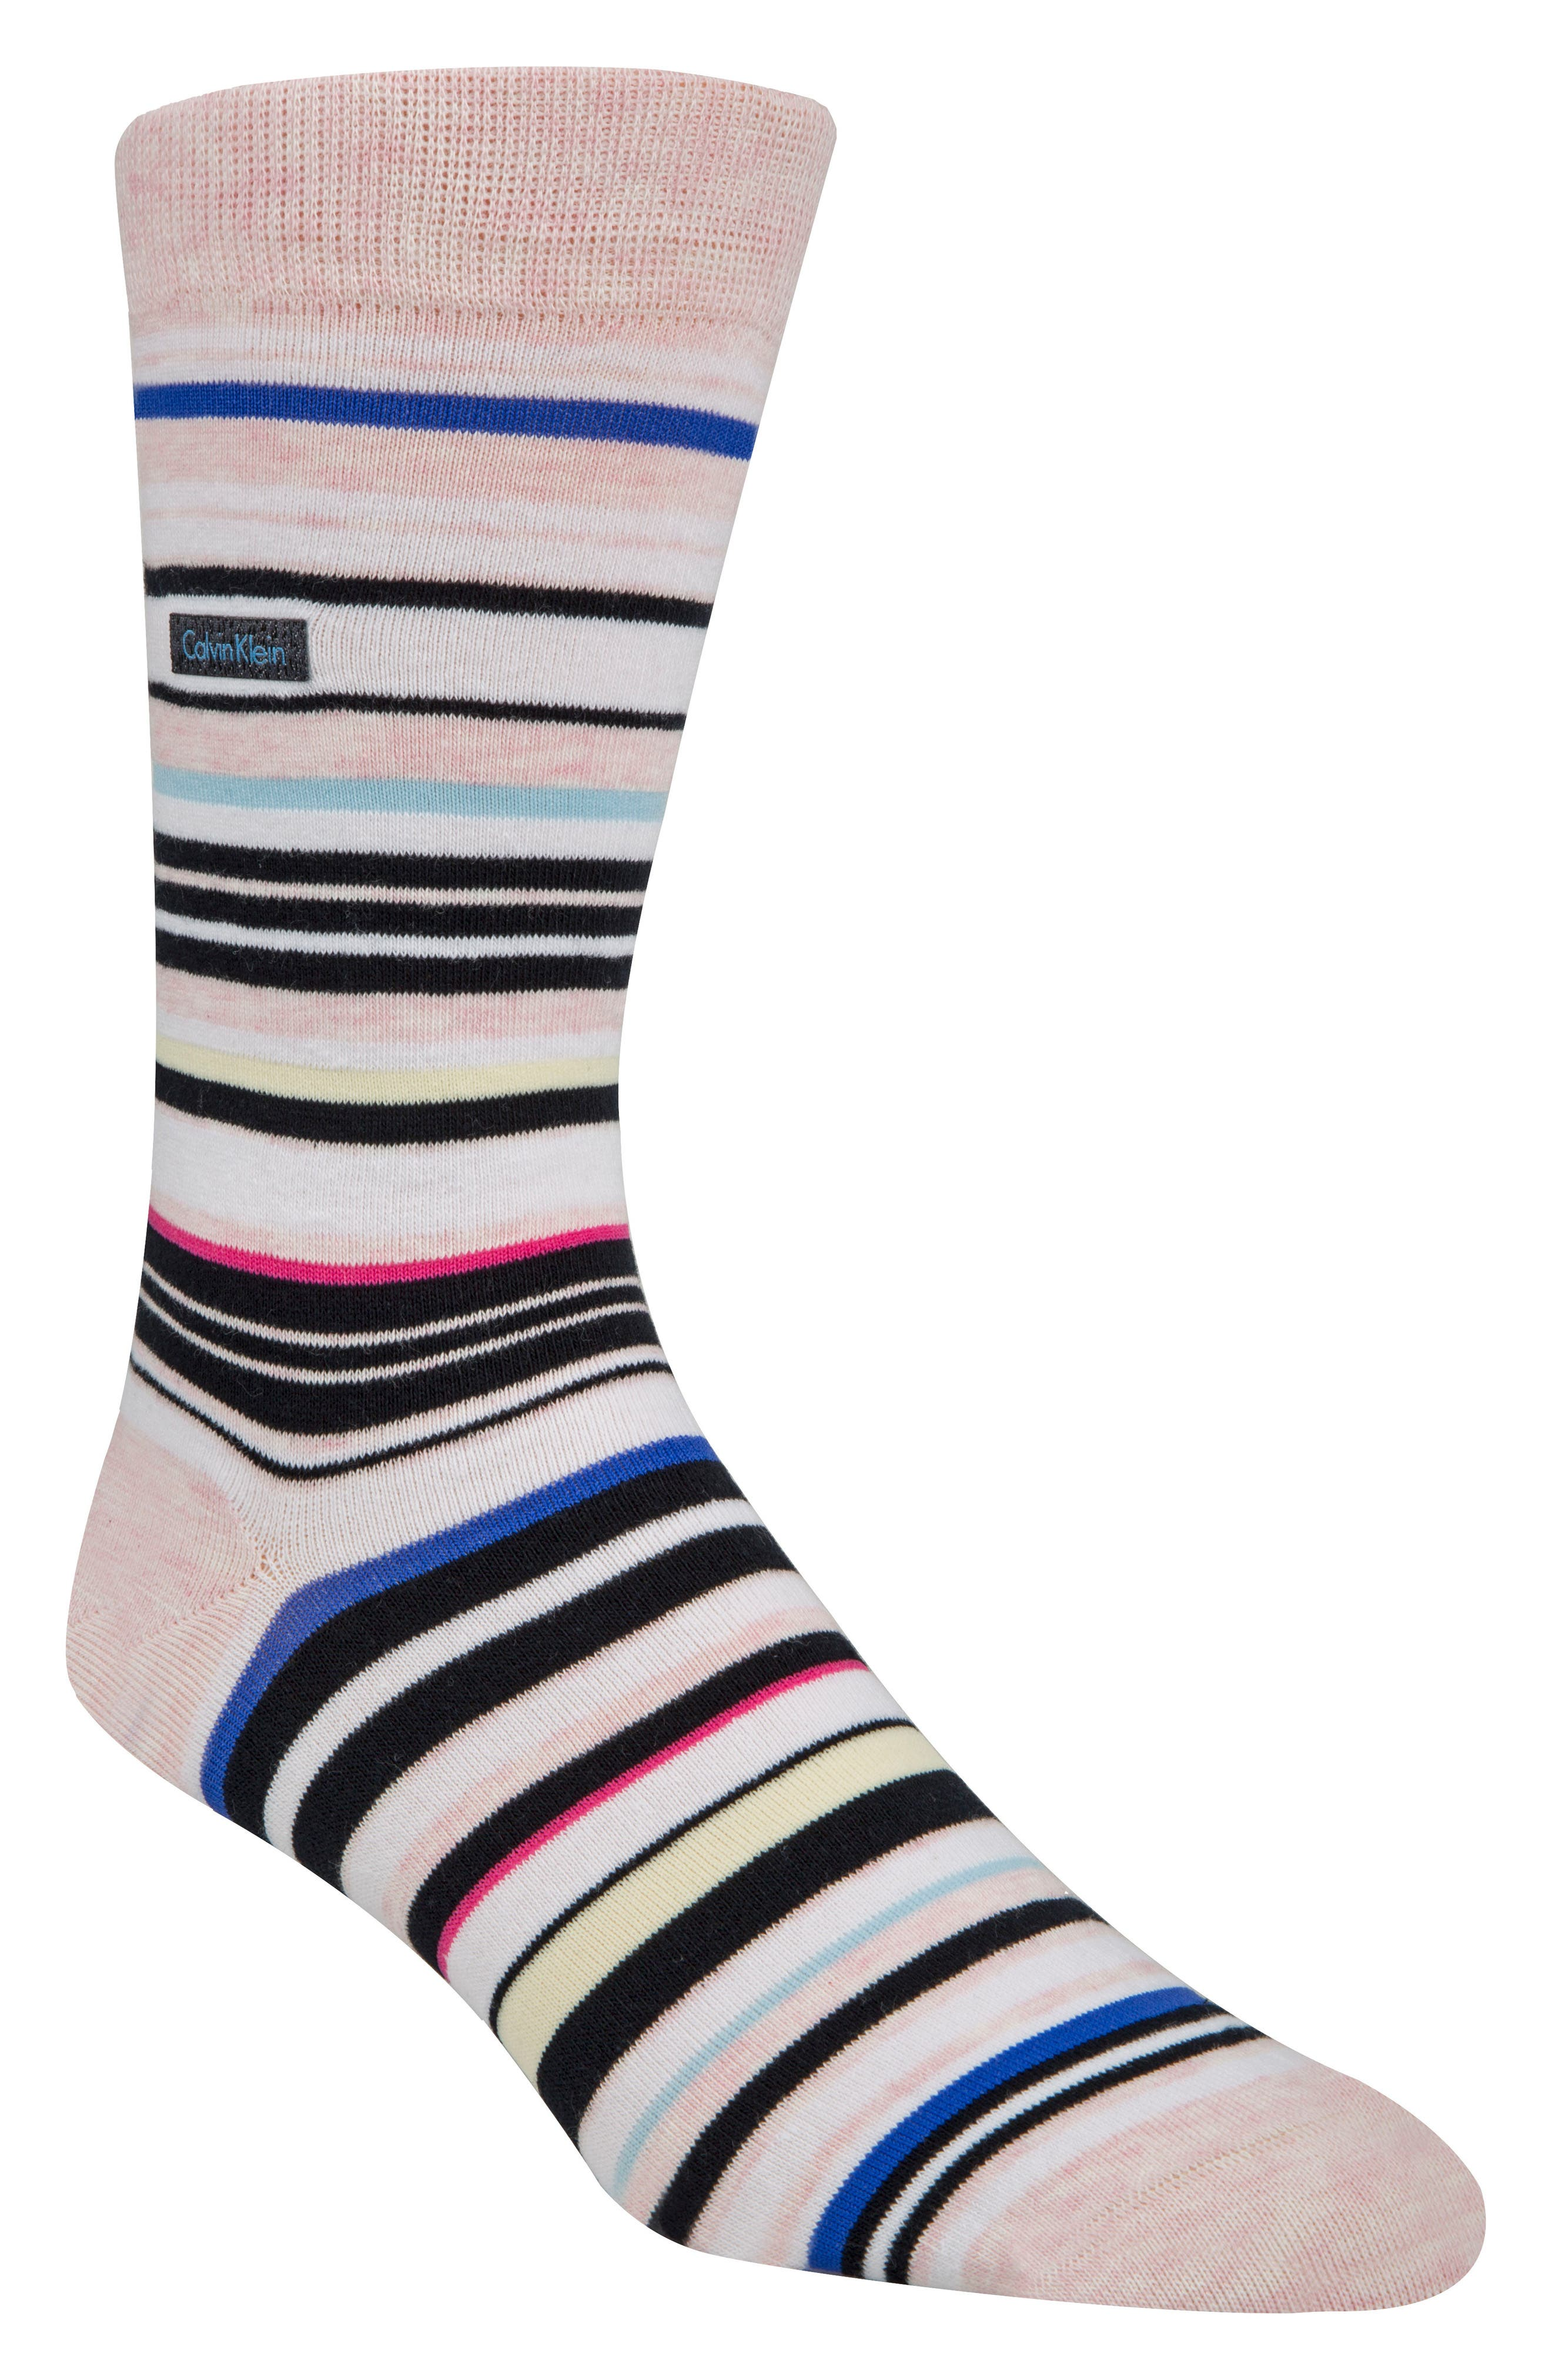 Multistripe Emblem Socks,                             Main thumbnail 1, color,                             FADED PINK